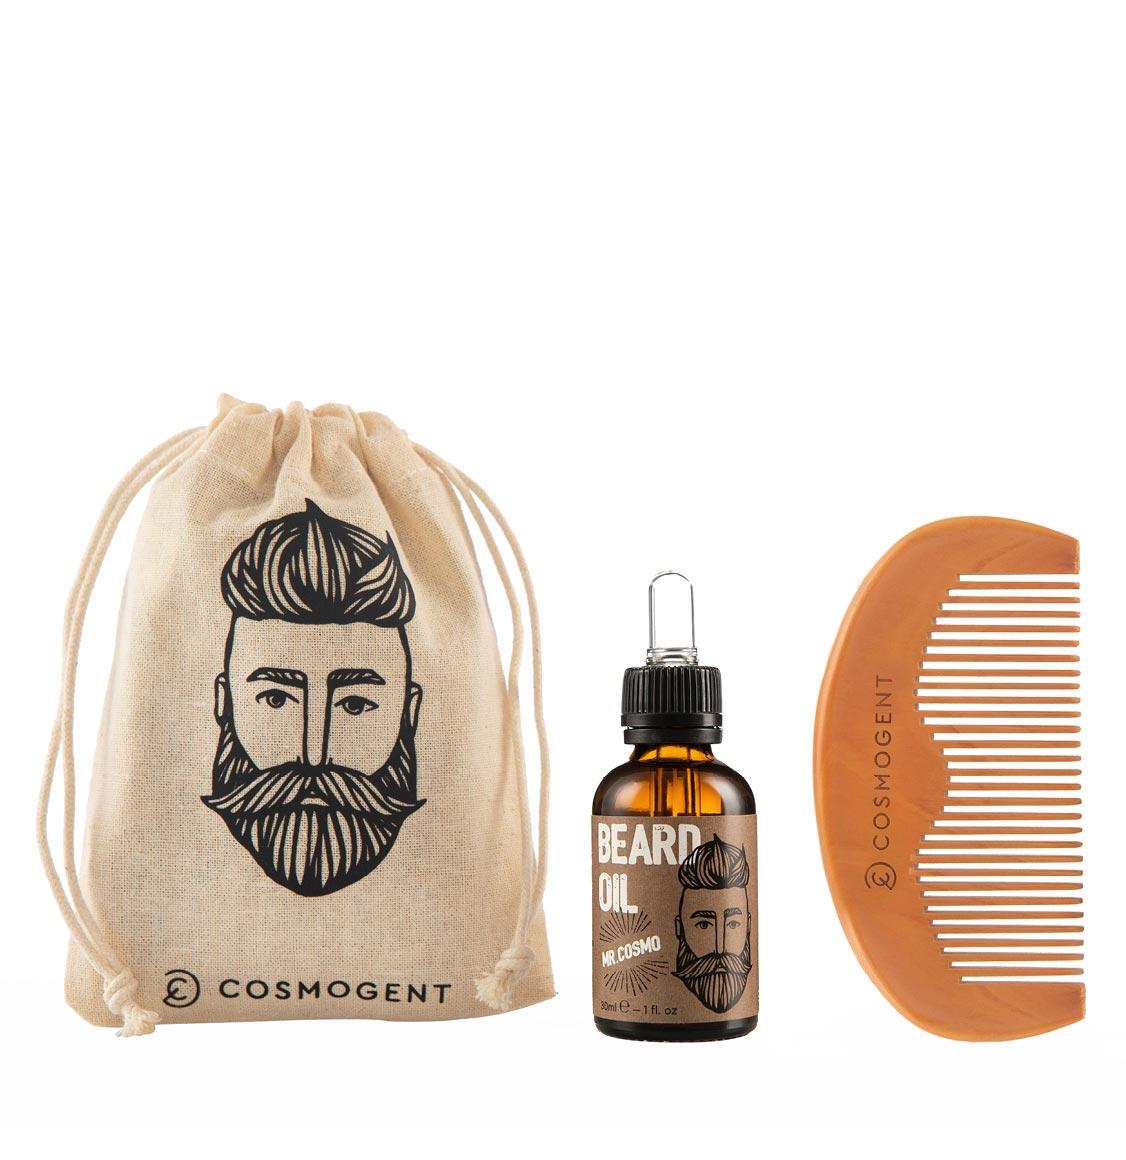 Cosmogent Mr. Cosmo Bundle Beard Oil 30ml And Beard Comb